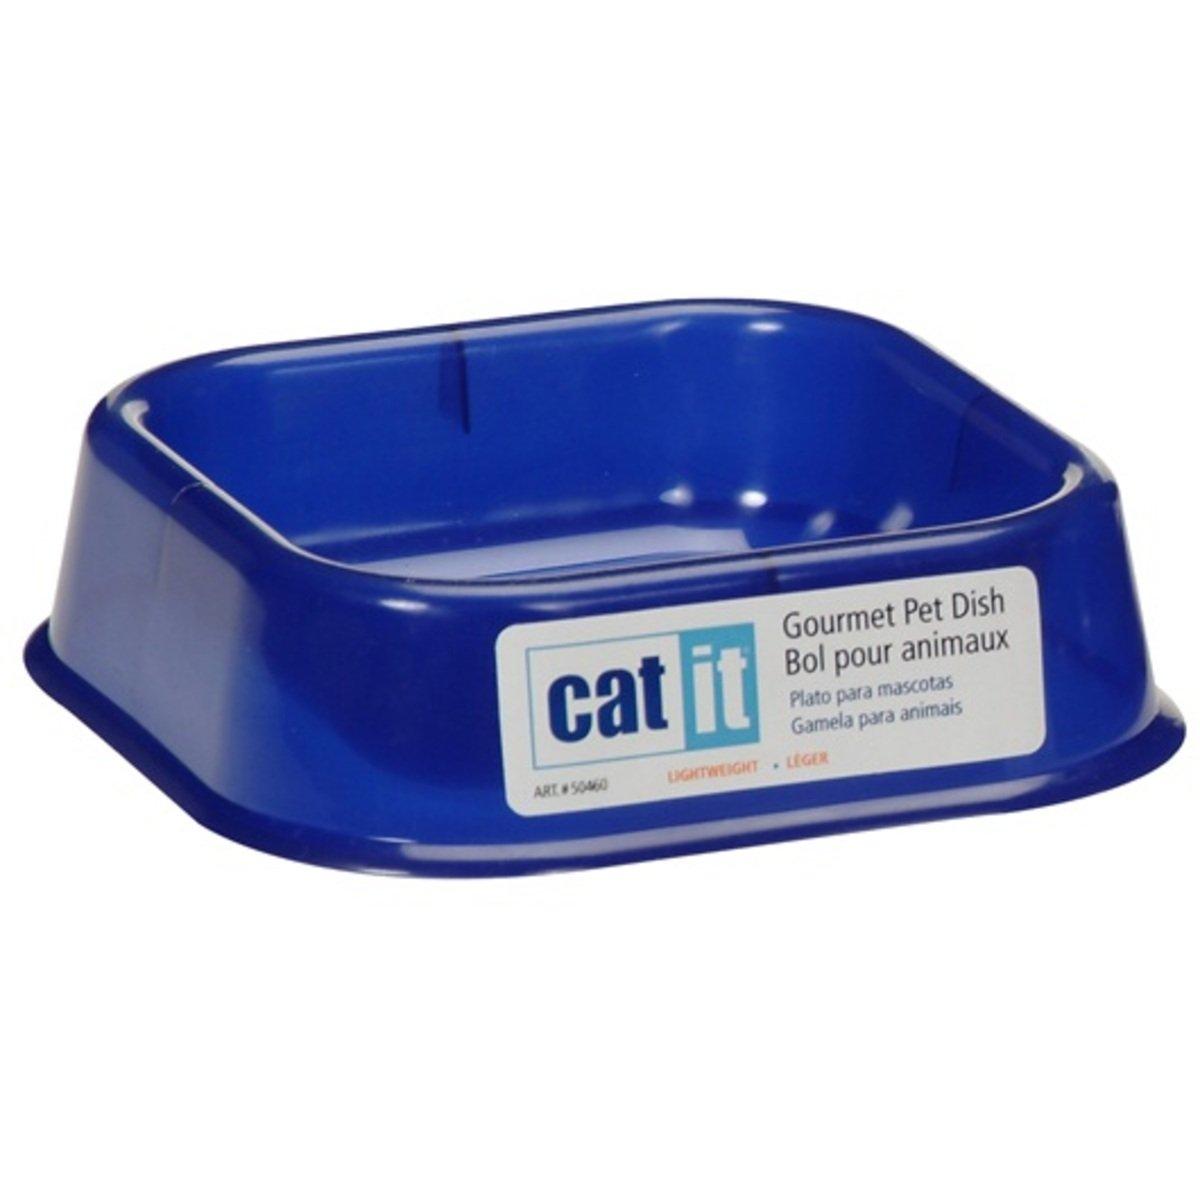 Catit輕身海洋藍貓用方形食物碗